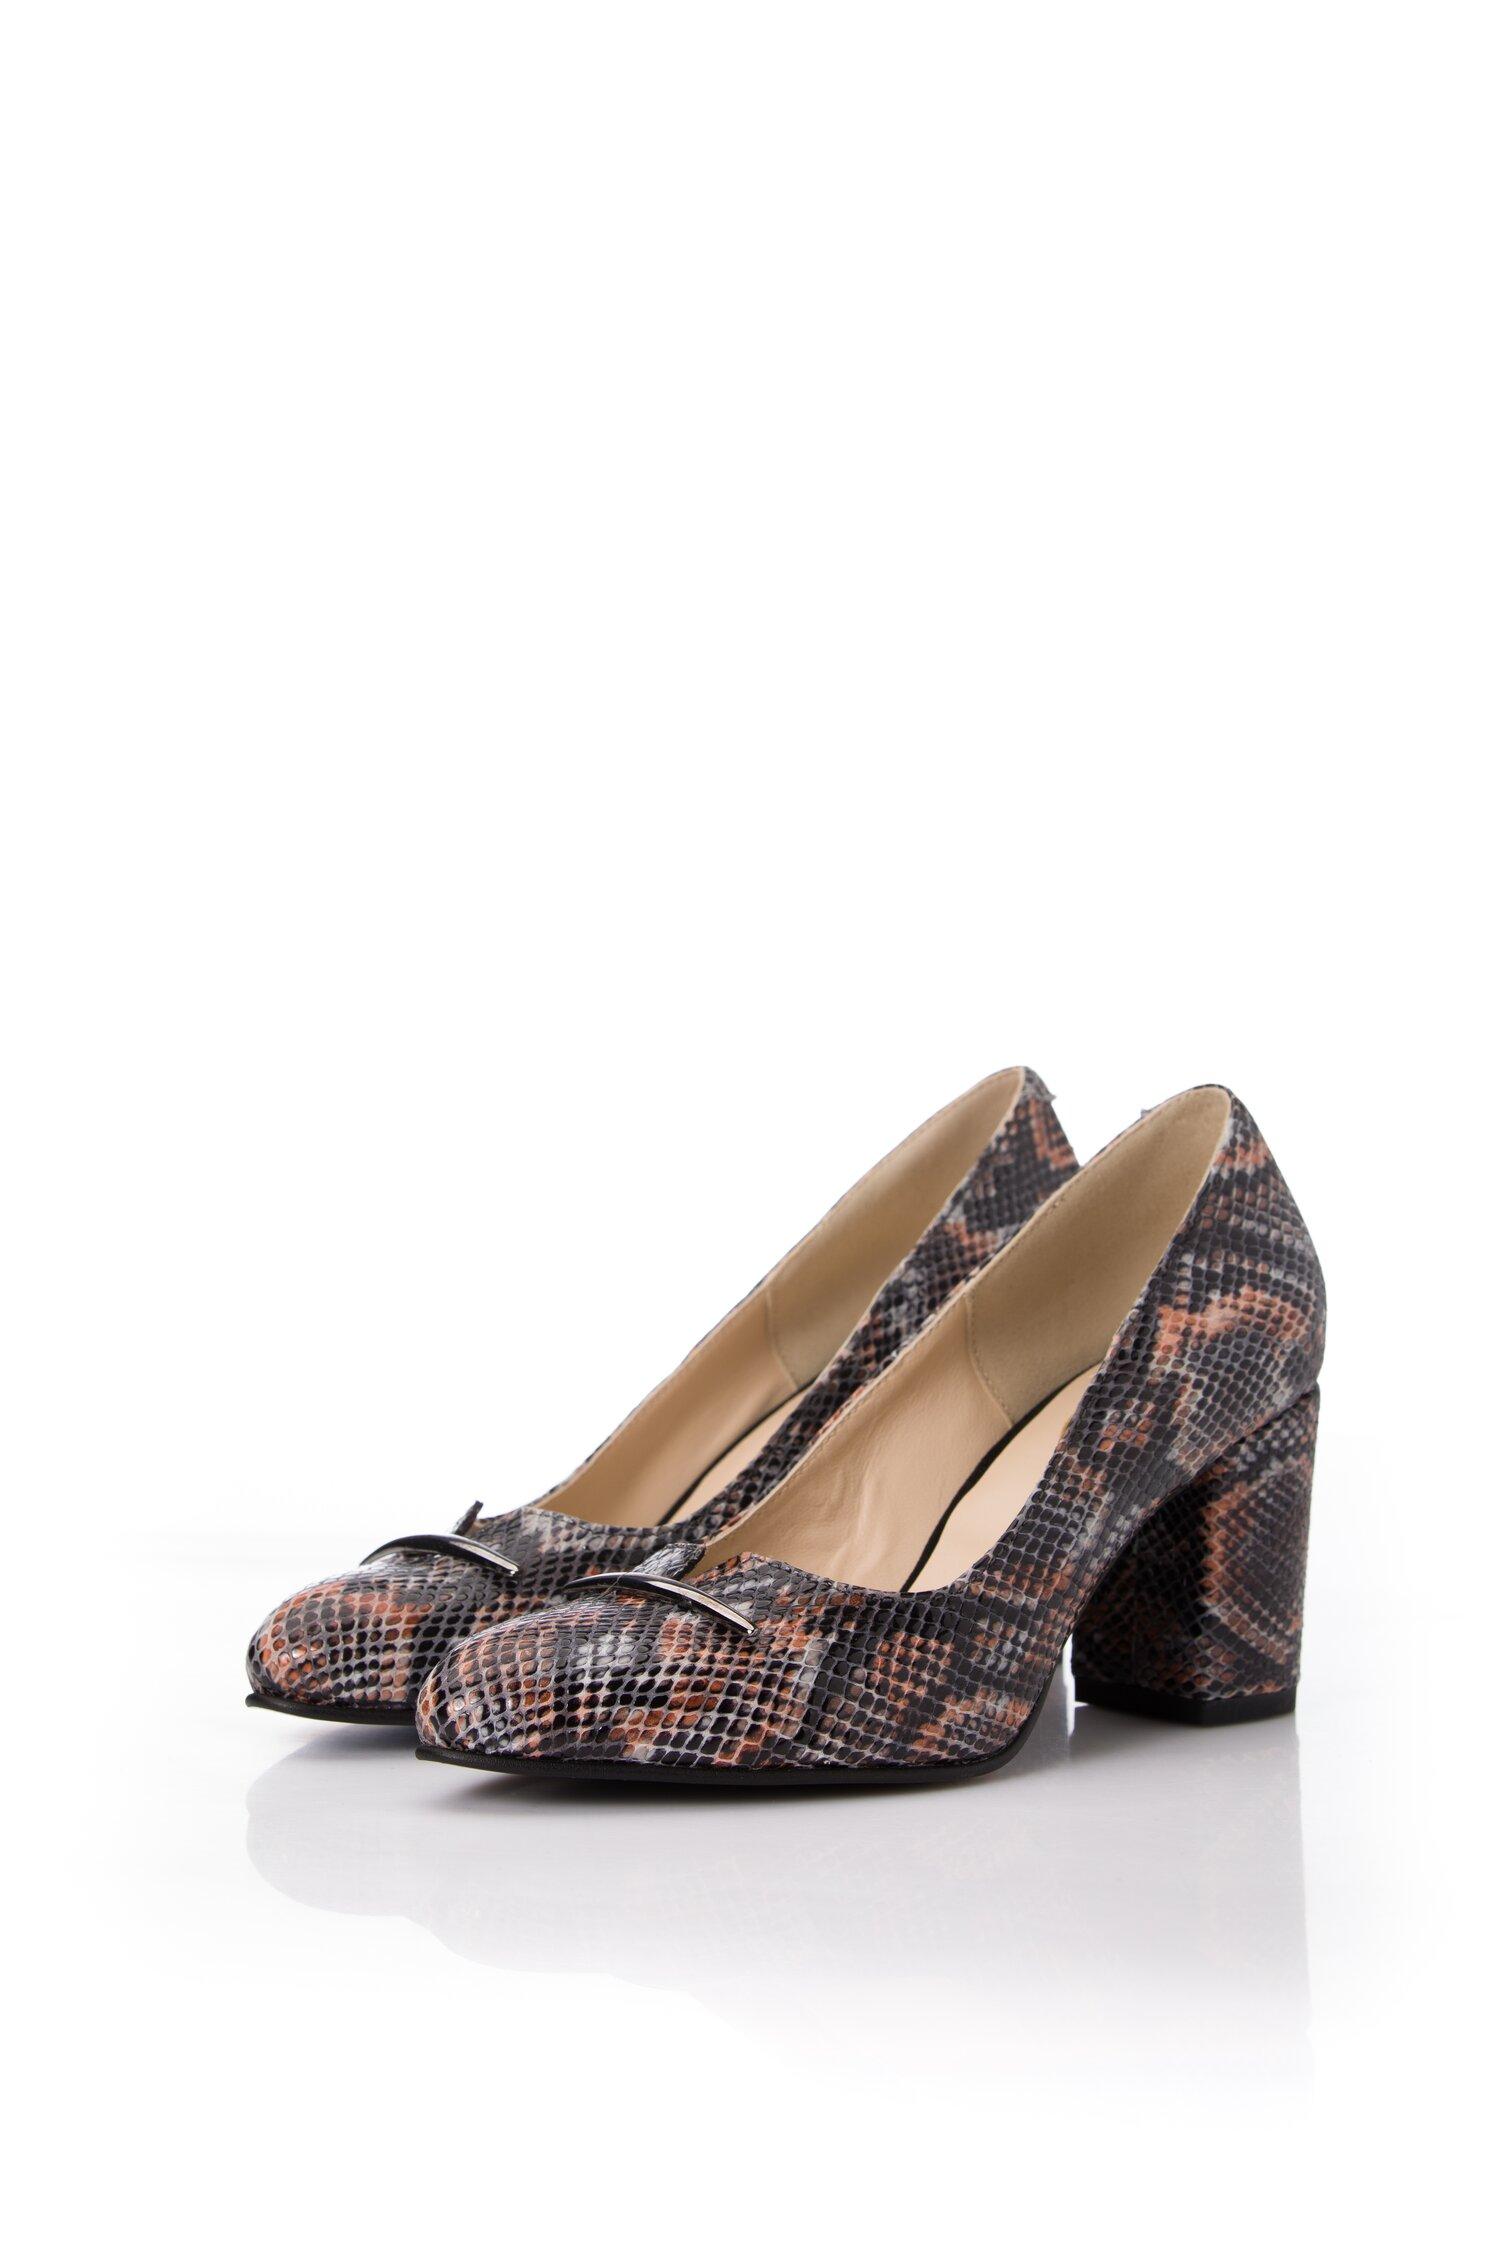 Pantofi din piele snakeprint si aplicatie pe varf imagine